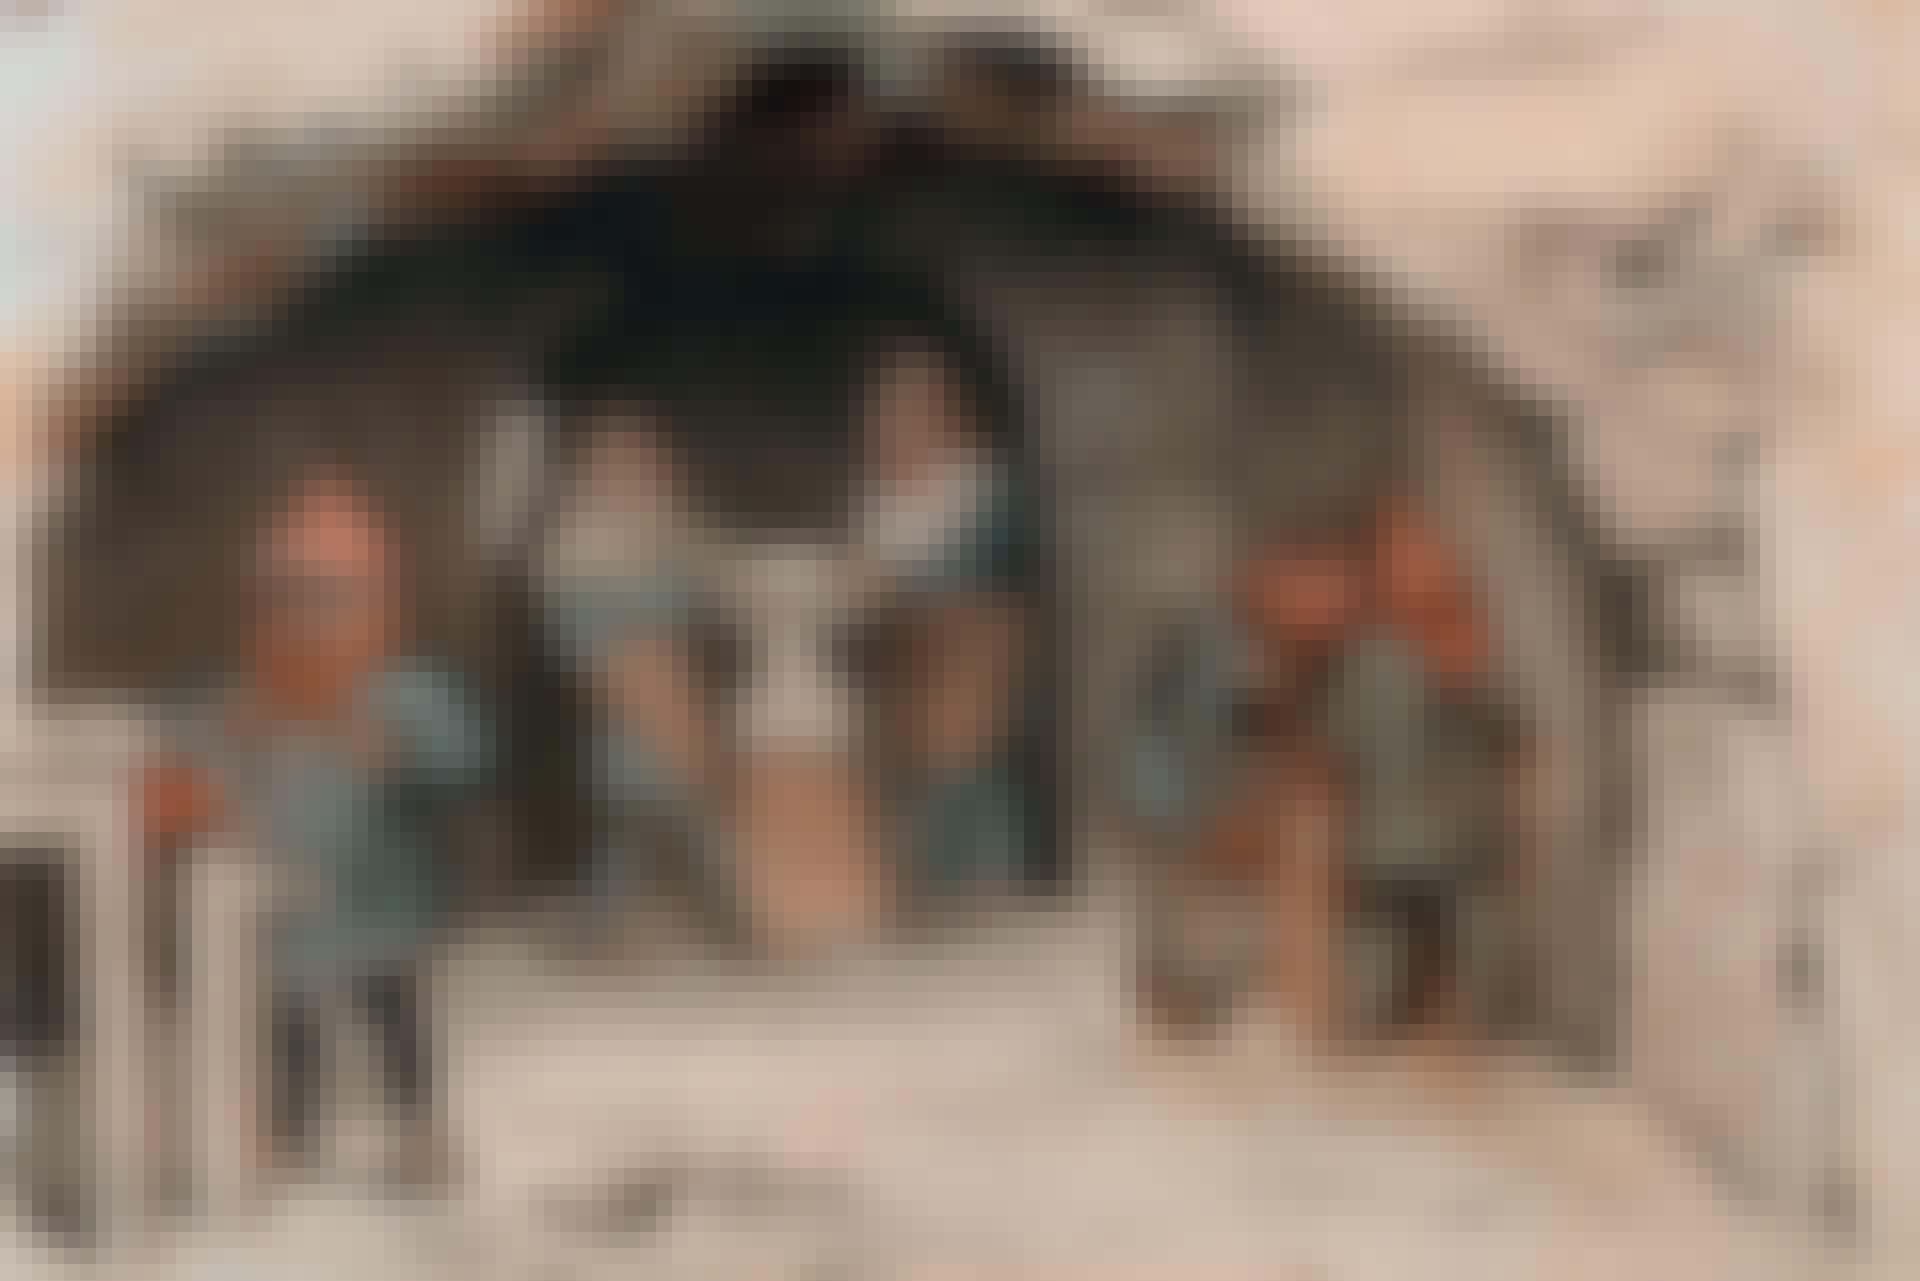 Nisse - Hvor kom troen på nissen fra?